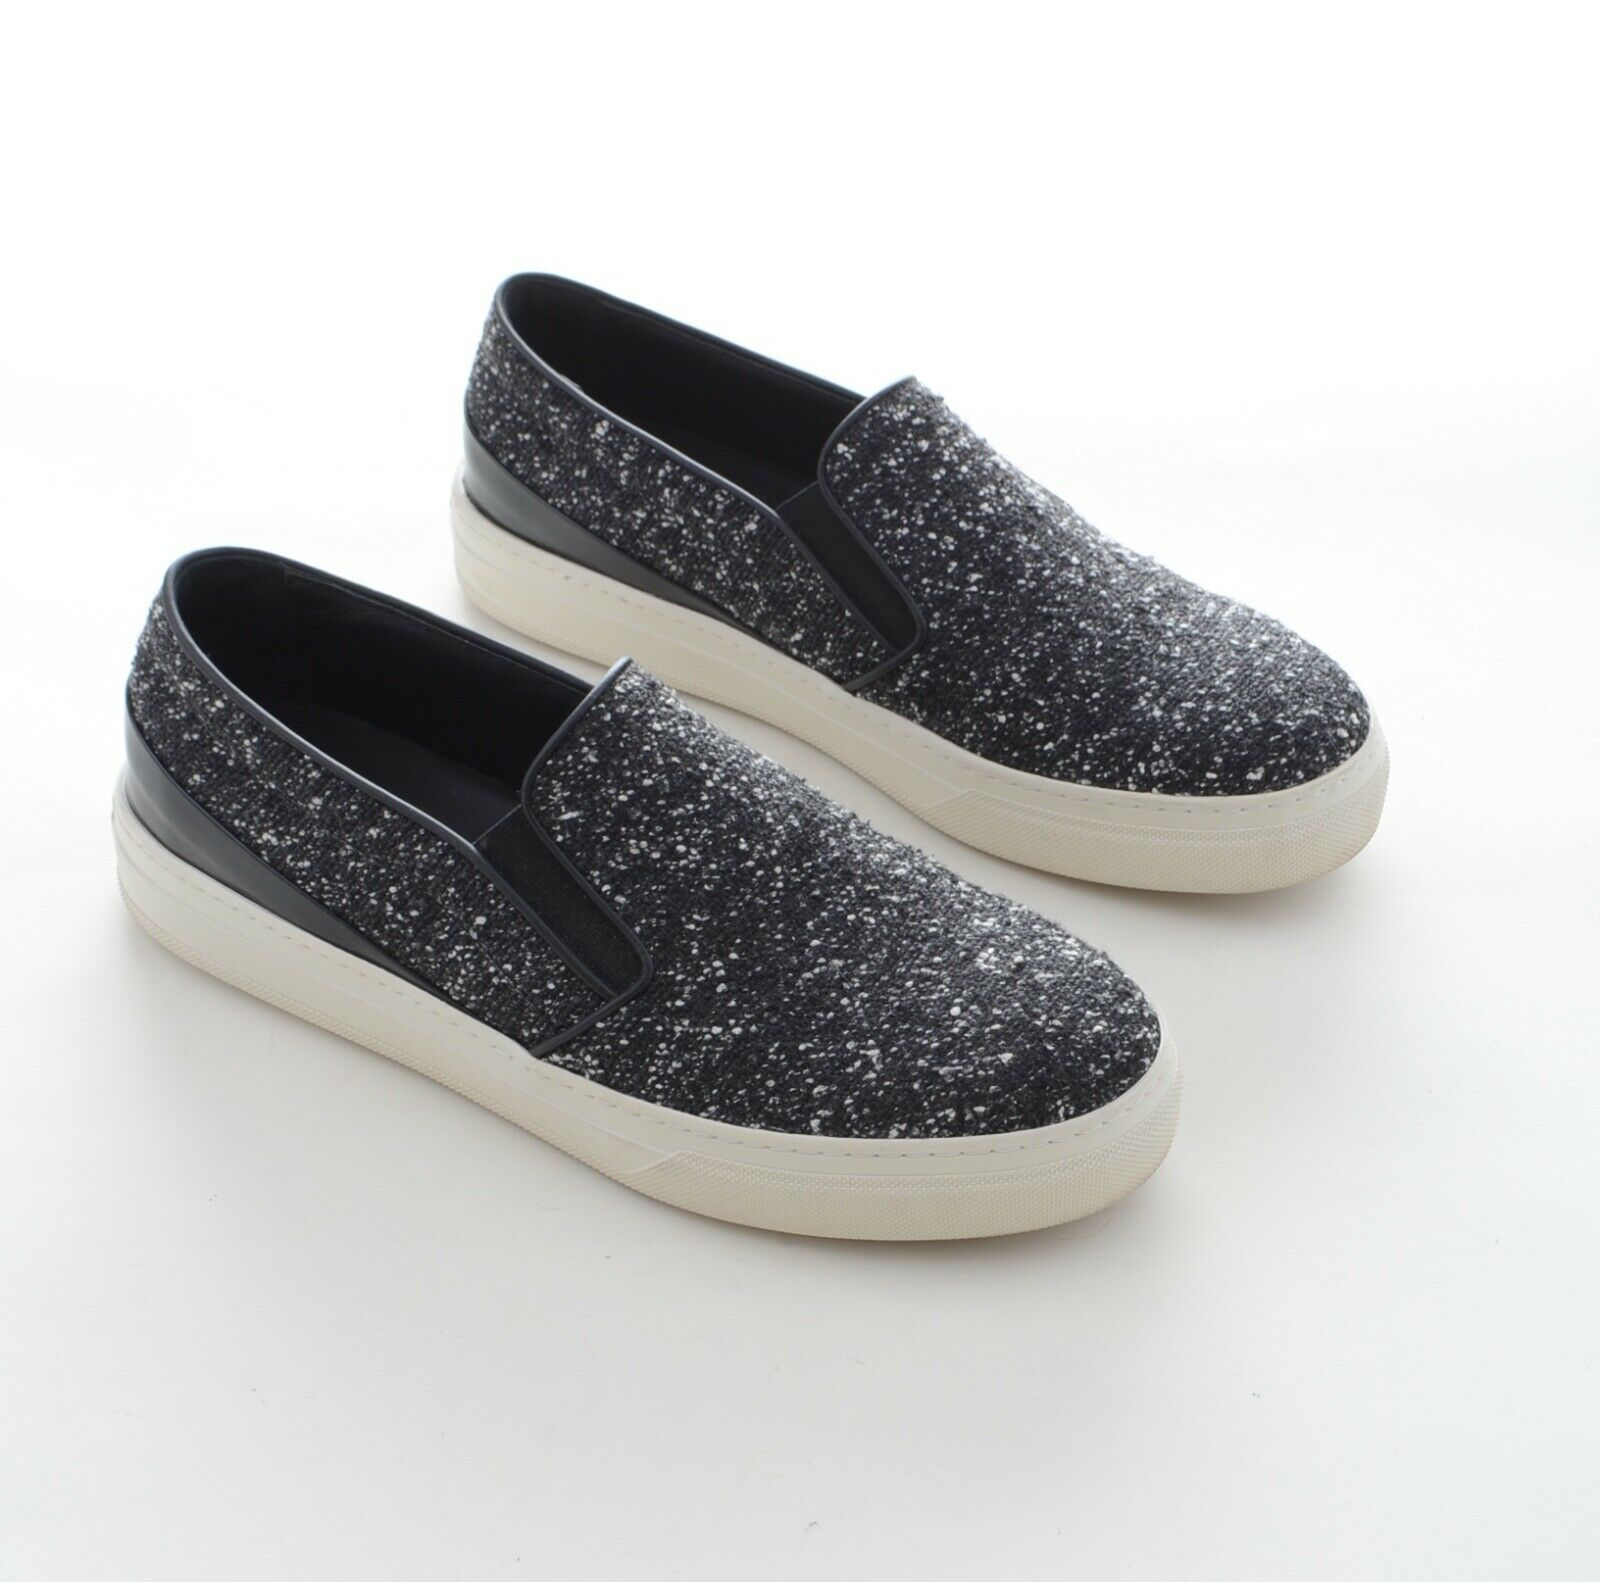 TOD`s Damen Boucle Halbschuhe Slipper Leder Textil Gr 38,5 Grau Schwarz 1-2x get